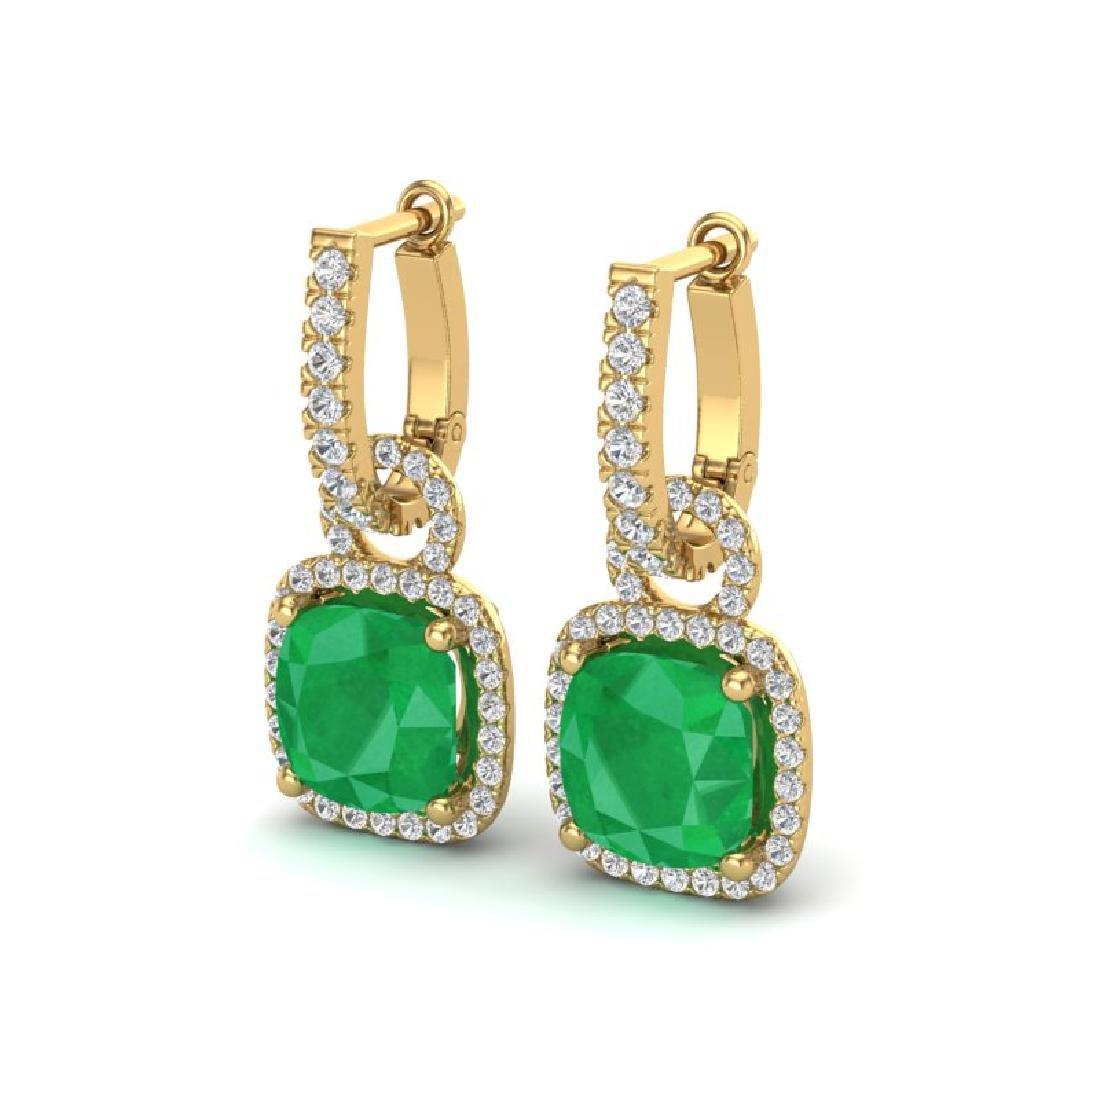 6 CTW Emerald & Micro Pave VS/SI Diamond Earrings 18K